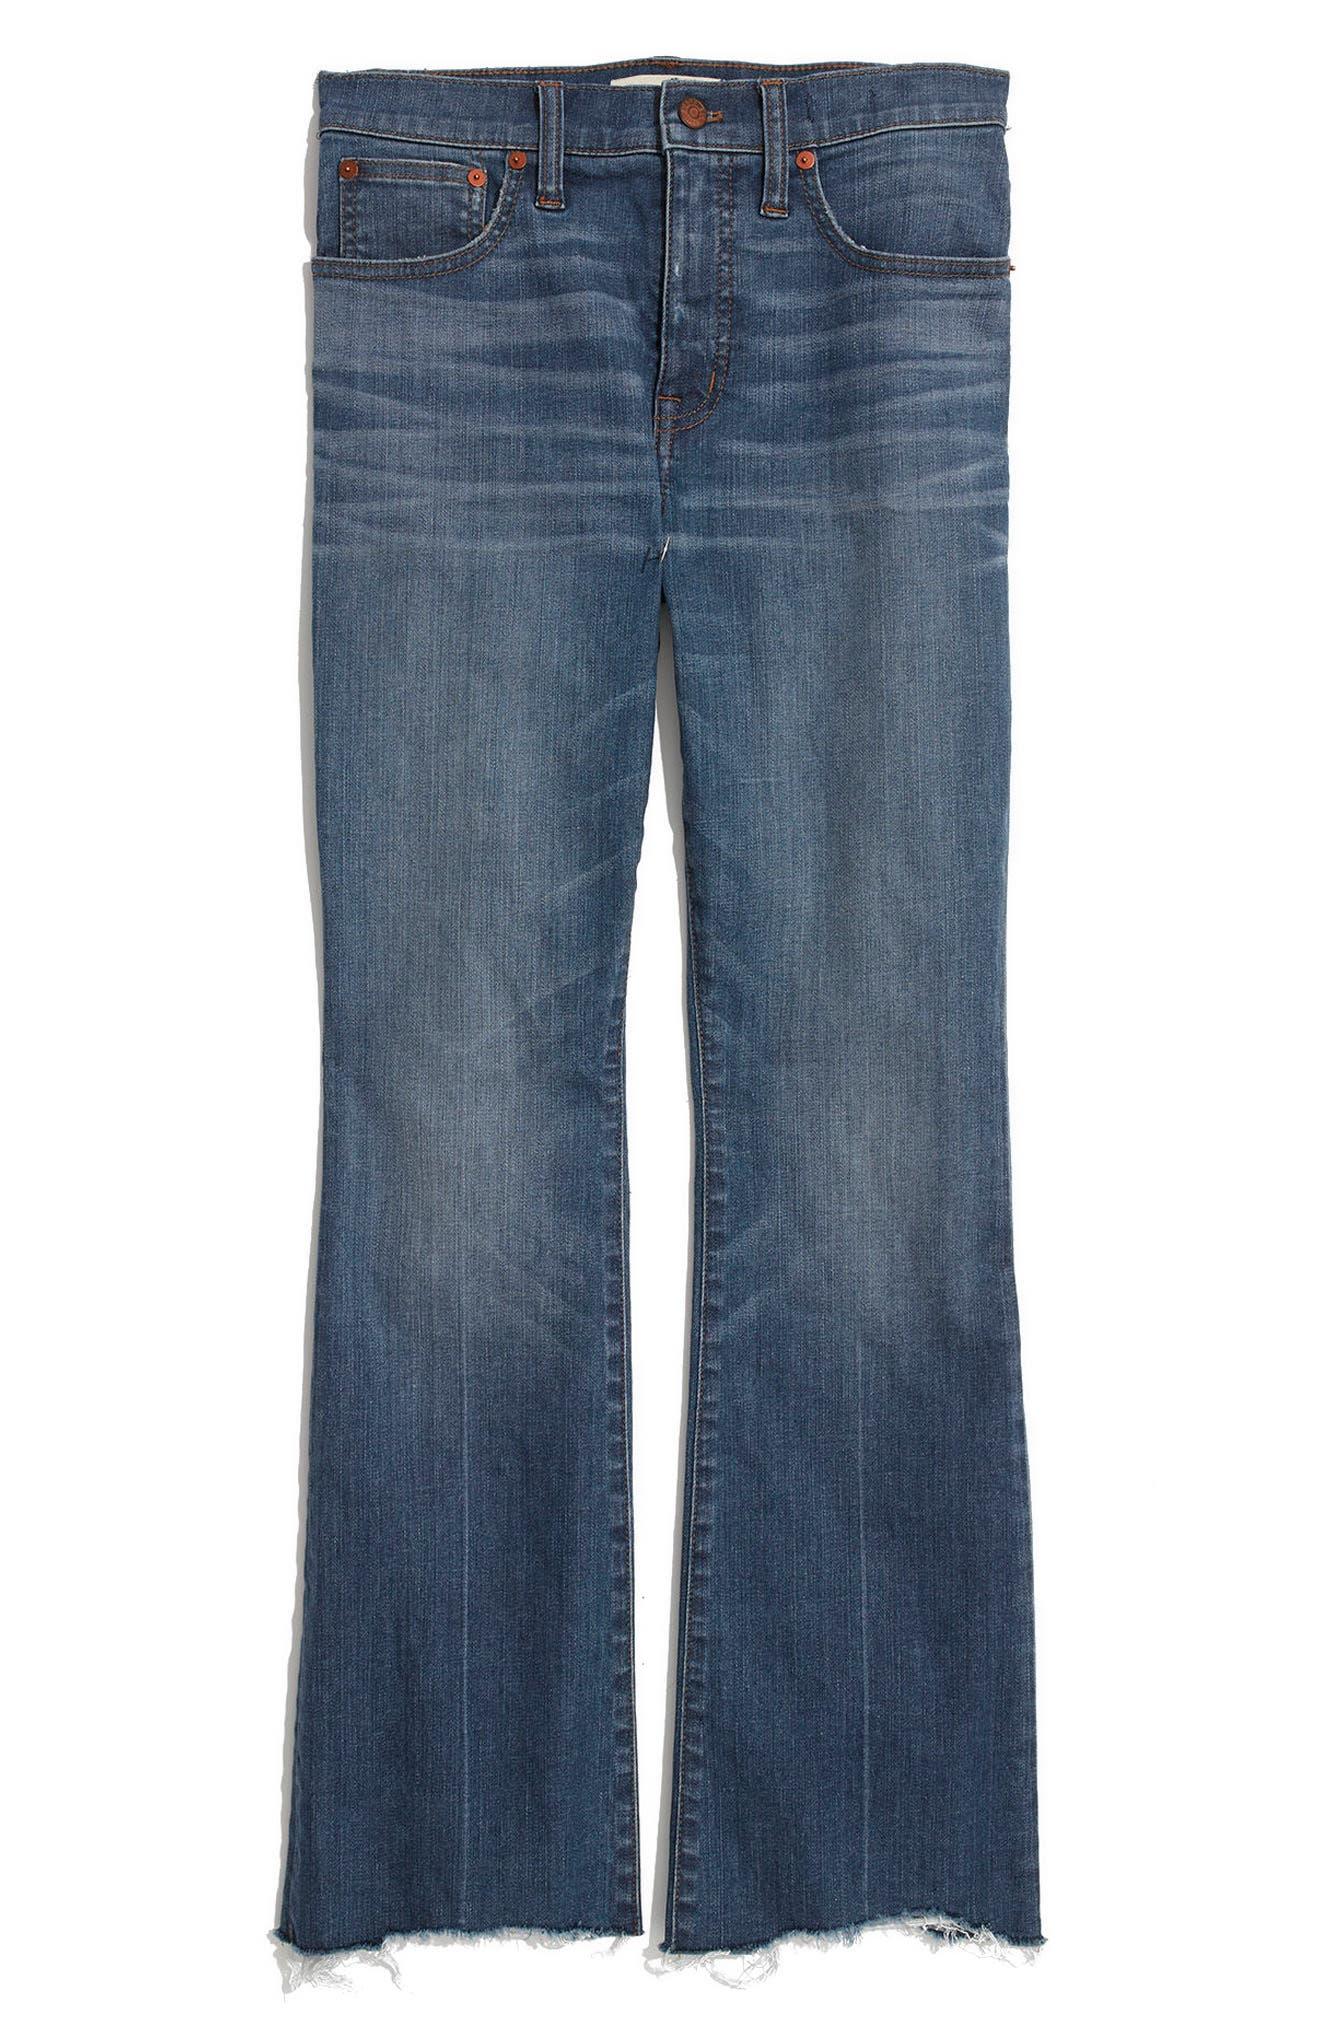 Cali Demi Boot Jeans,                             Alternate thumbnail 4, color,                             Haywood Wash